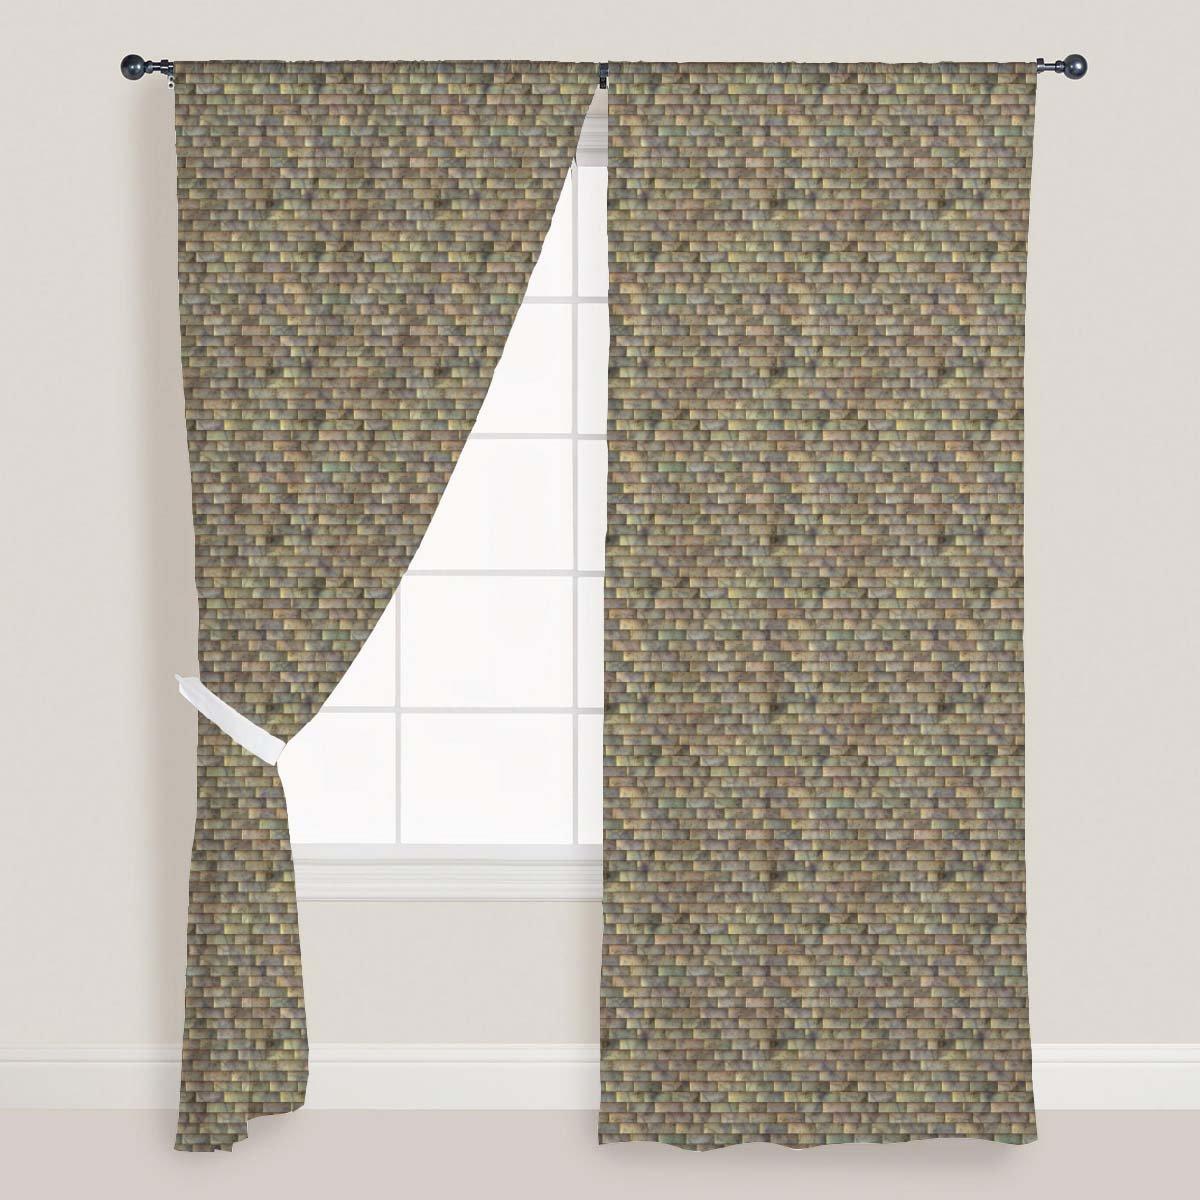 AZ Tiled Art Door & Window Curtain Satin 4feet x 10feet; SET OF 3 PCS